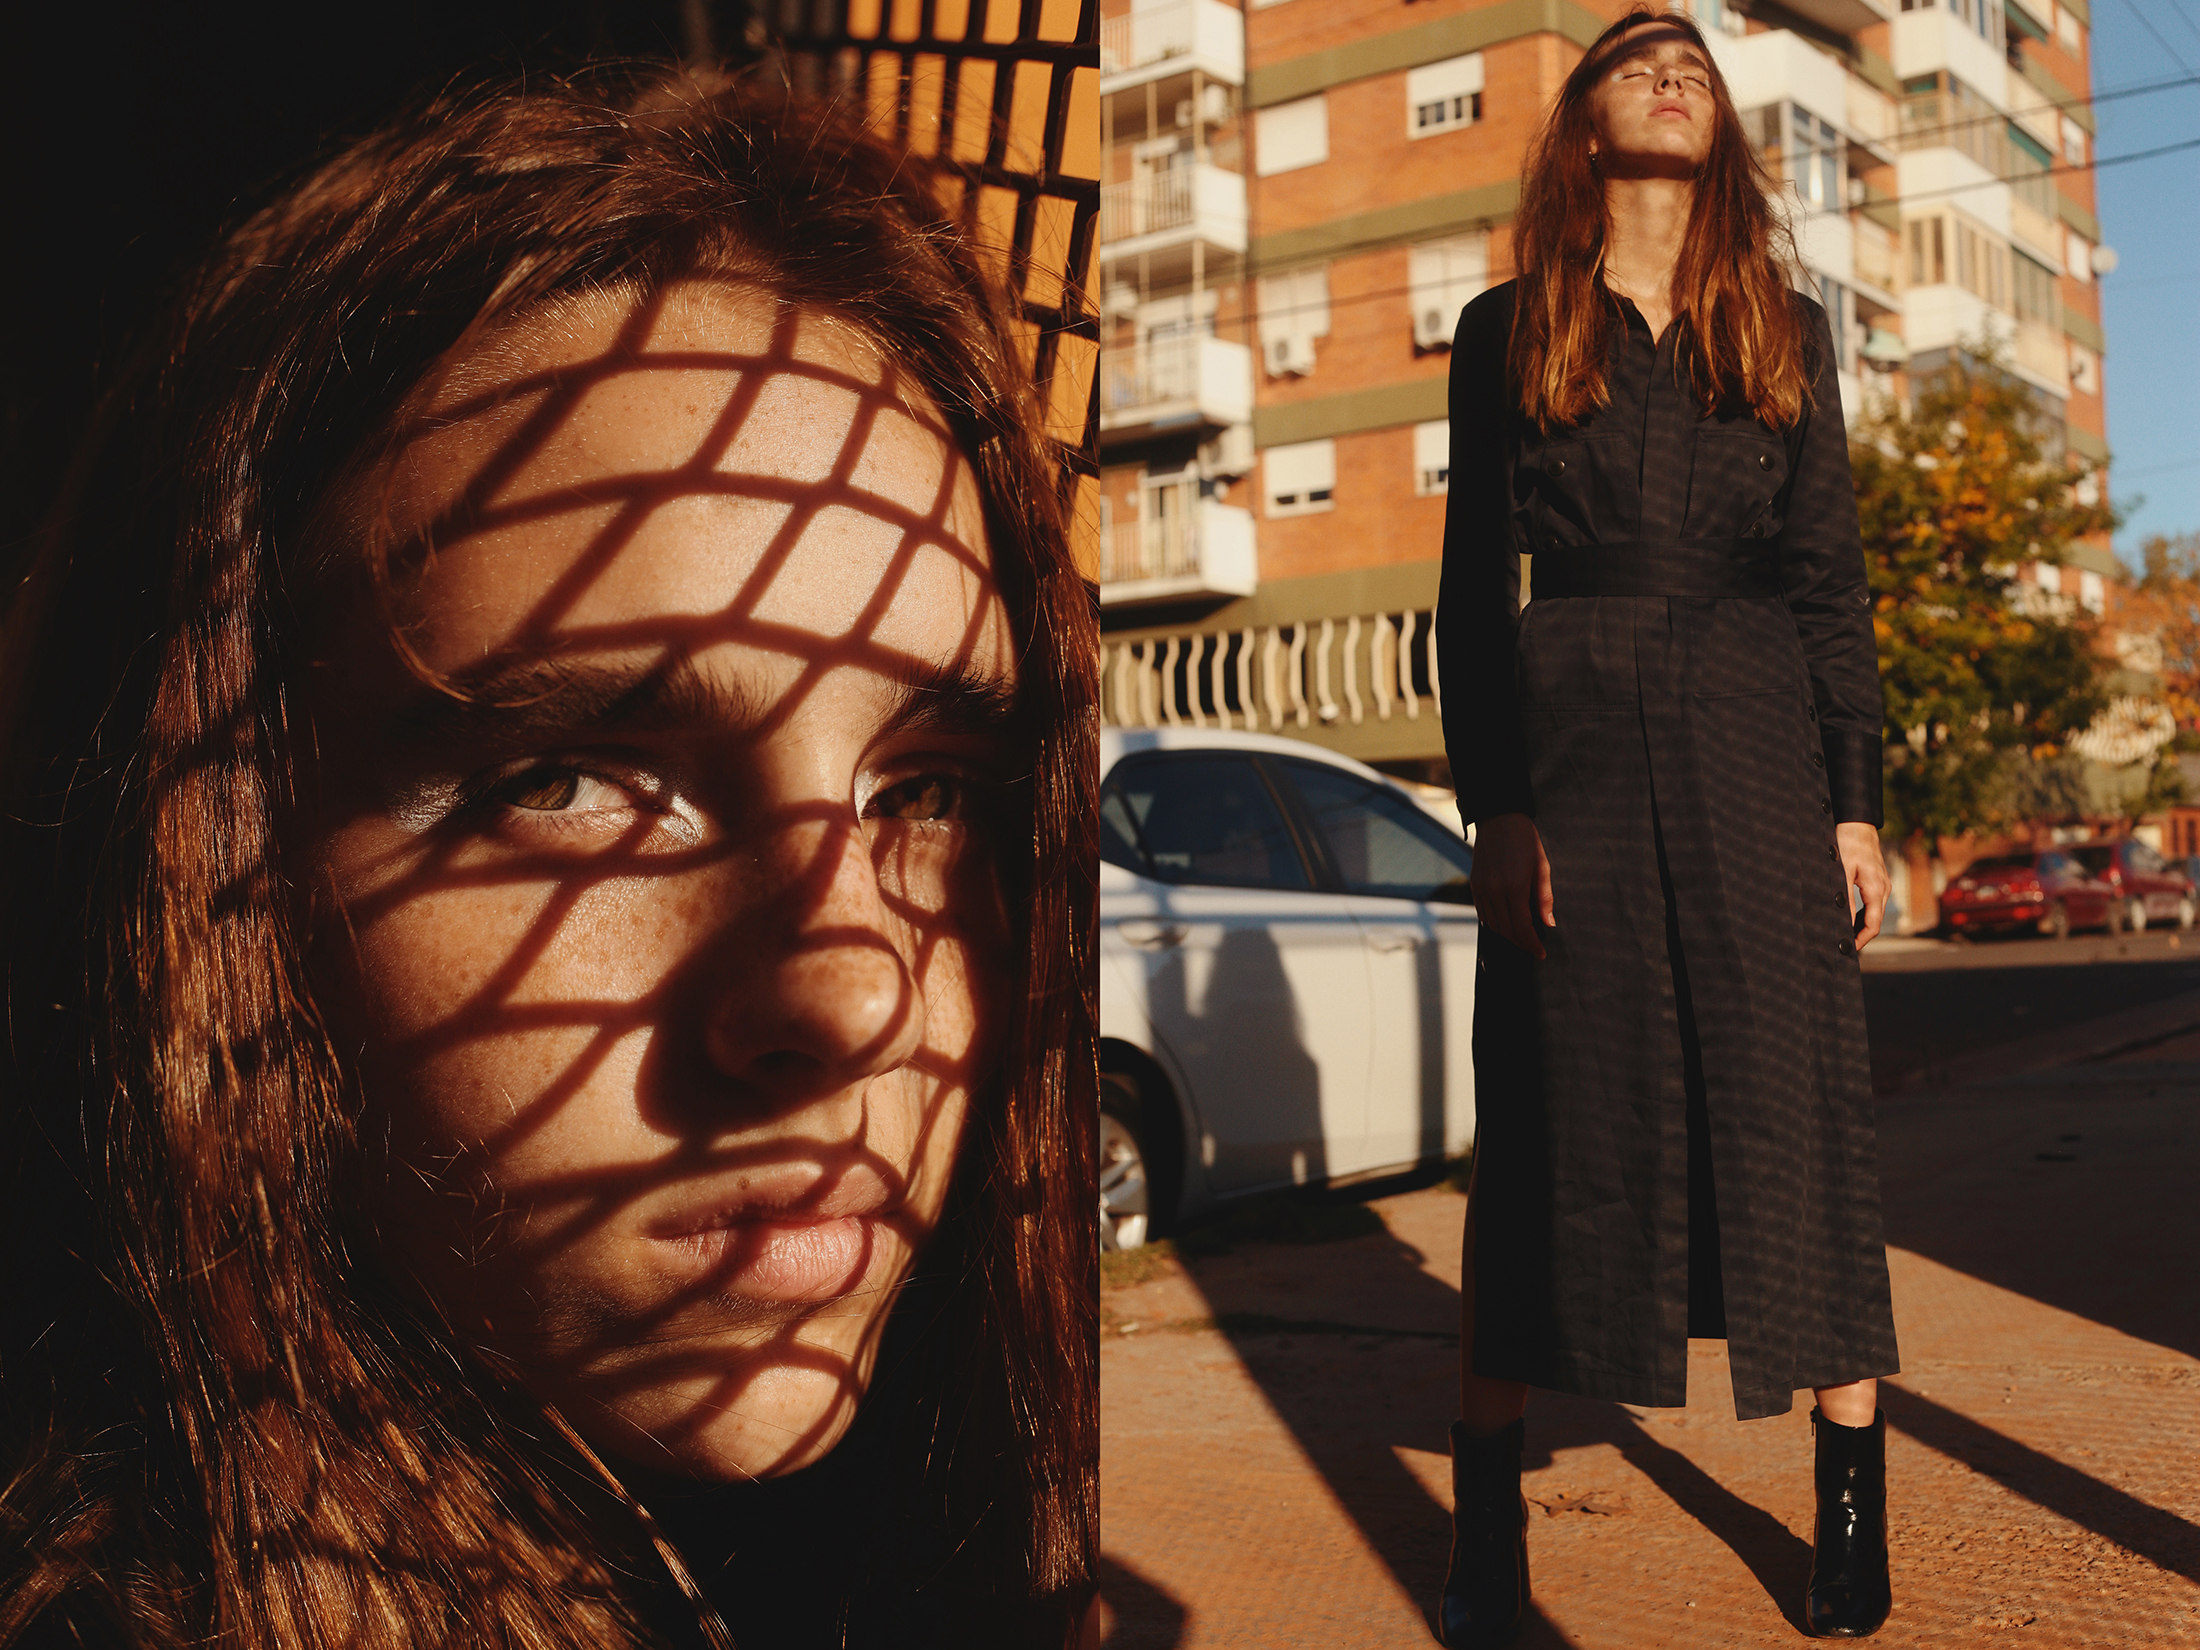 Too deep  Published on 04 April 2017   Photographer  Evelyn Sol  Stylist  Mar Sanchez  Model  Paloma @Lo Management